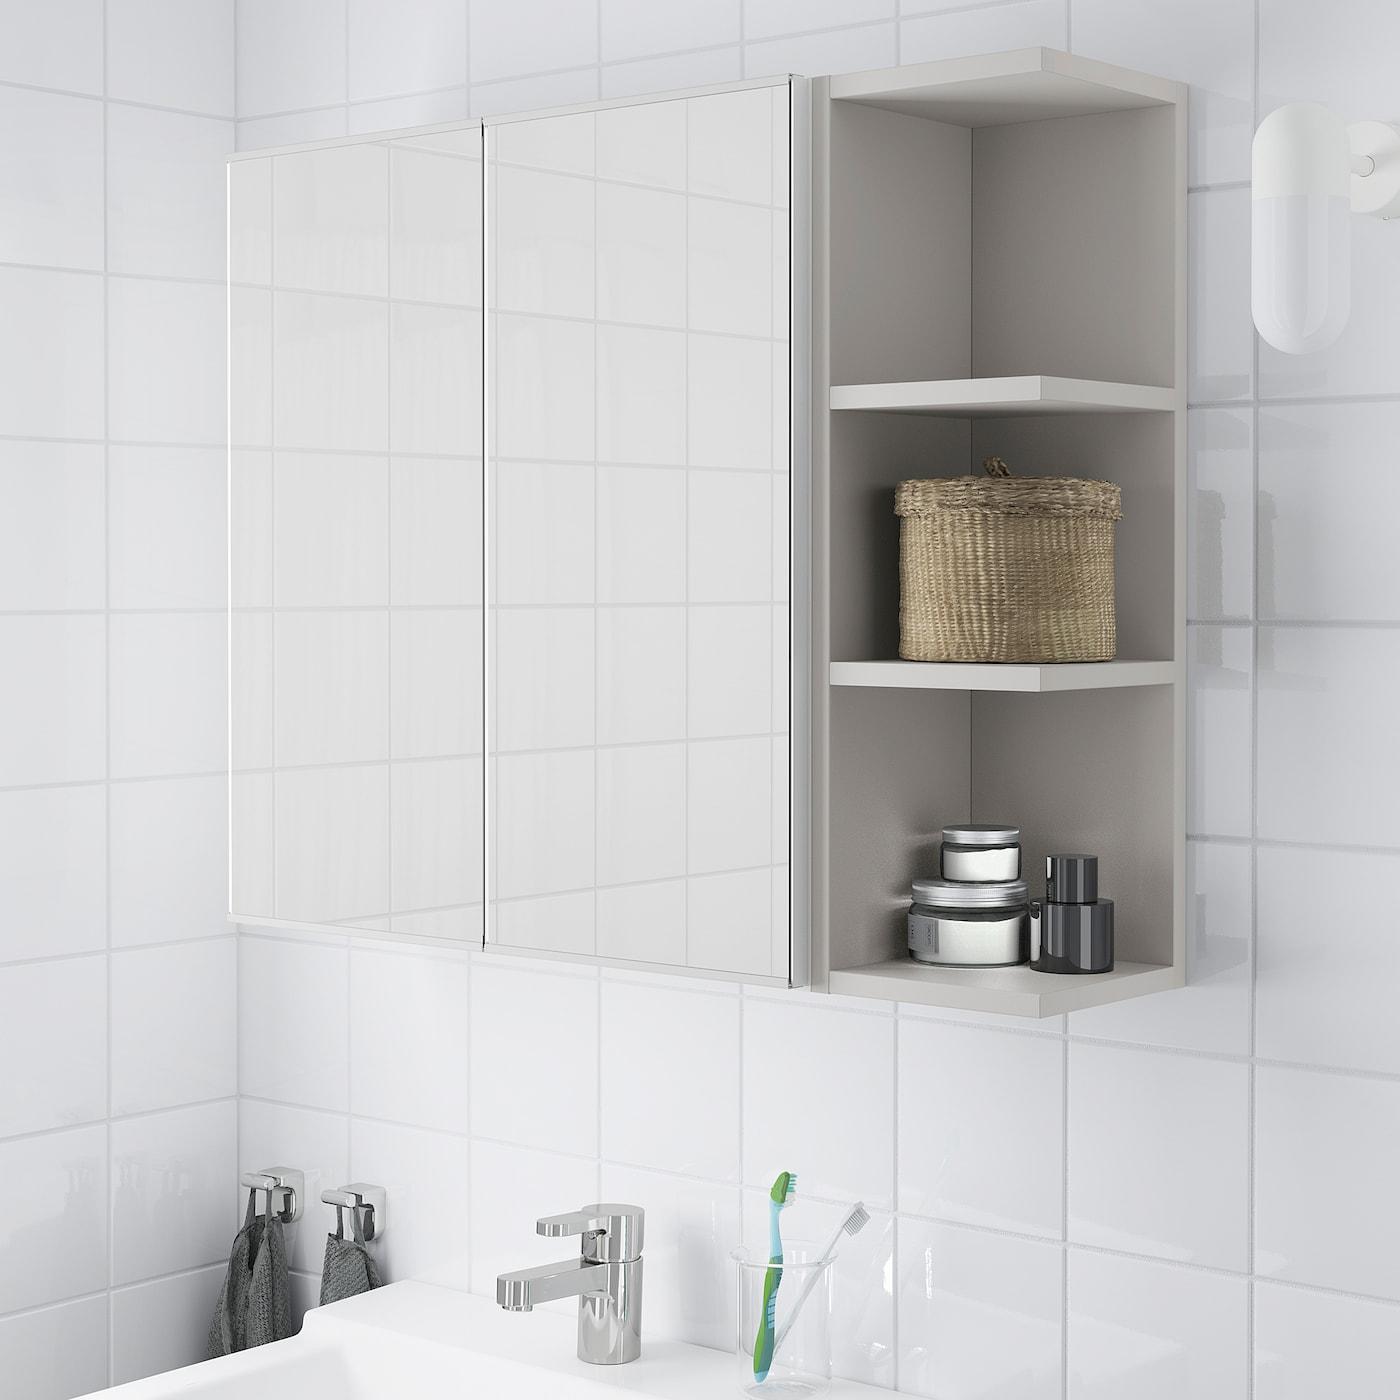 Lillangen Mirror Cabinet 2 Doors 1 End Unit White Gray 31 1 8x8 1 4x25 1 4 Ikea